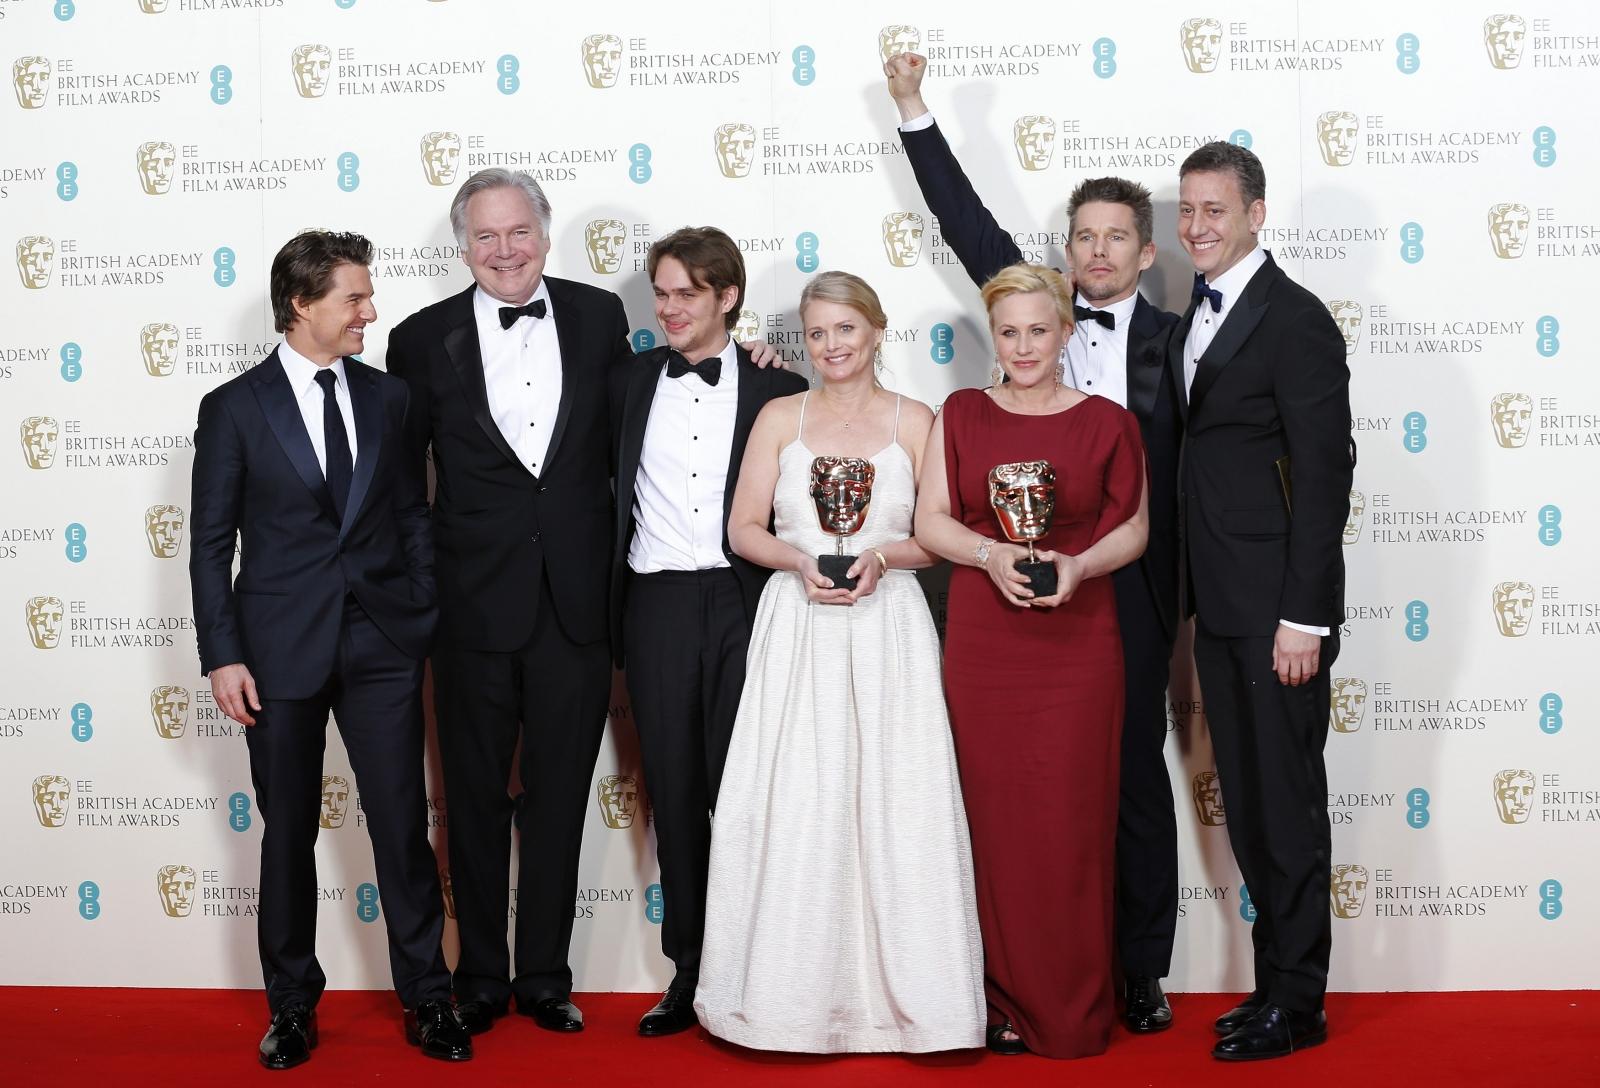 'Boyhood' scoops best film and director prizes at BAFTAs